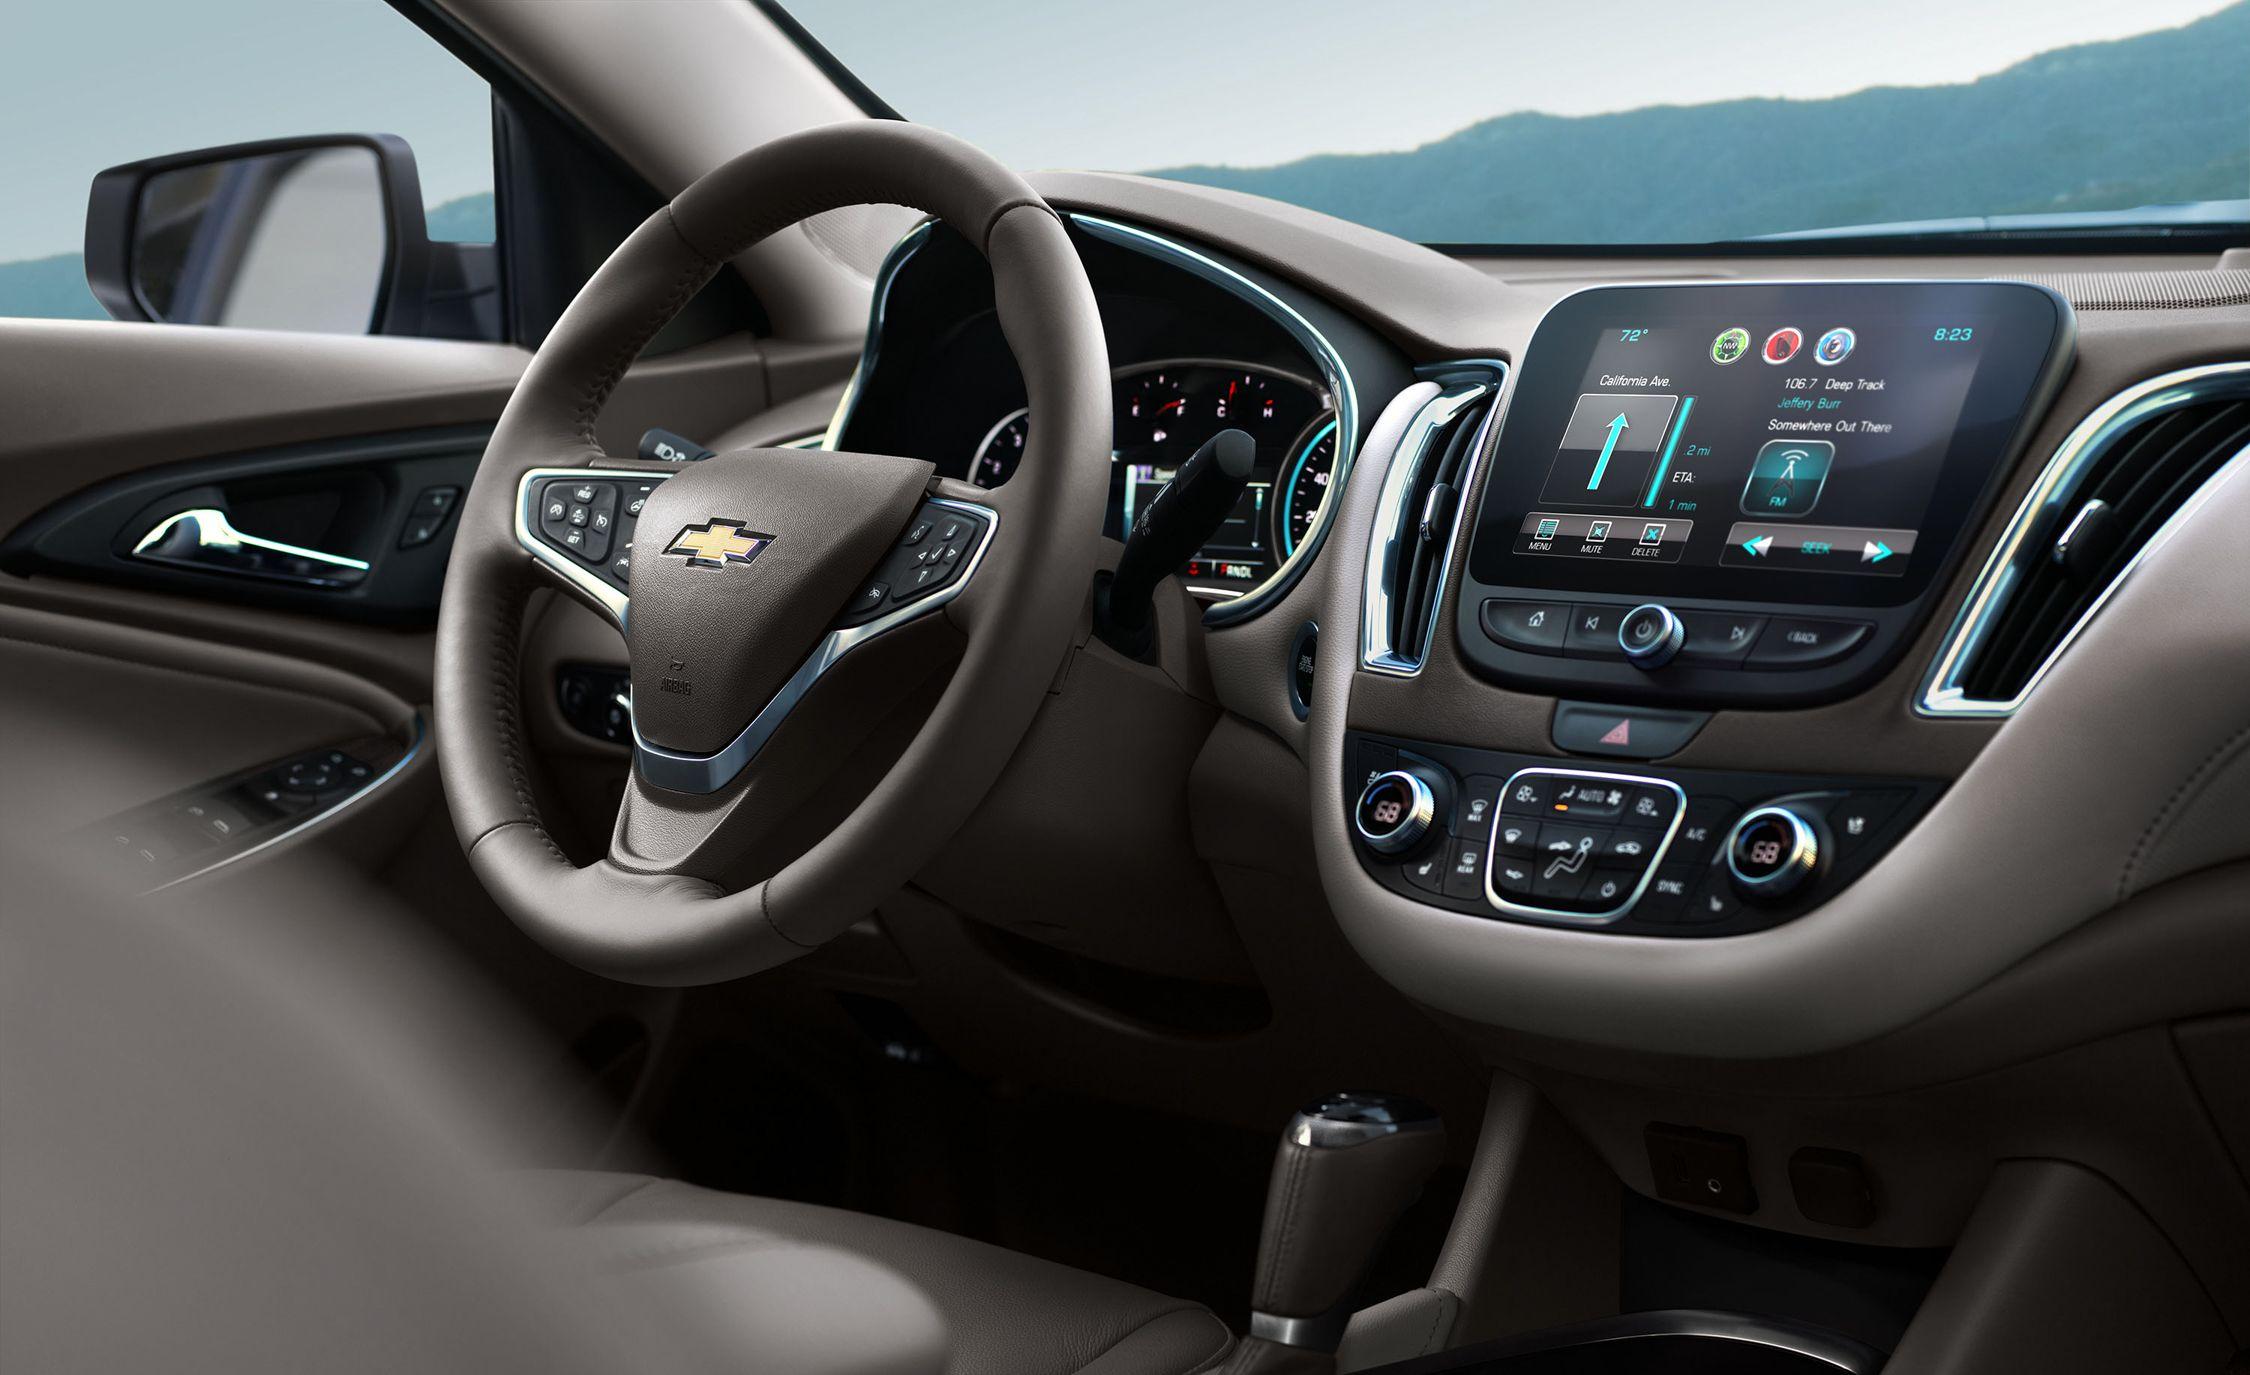 All New 2016 Chevrolet Malibu Gets Lower Starting Price